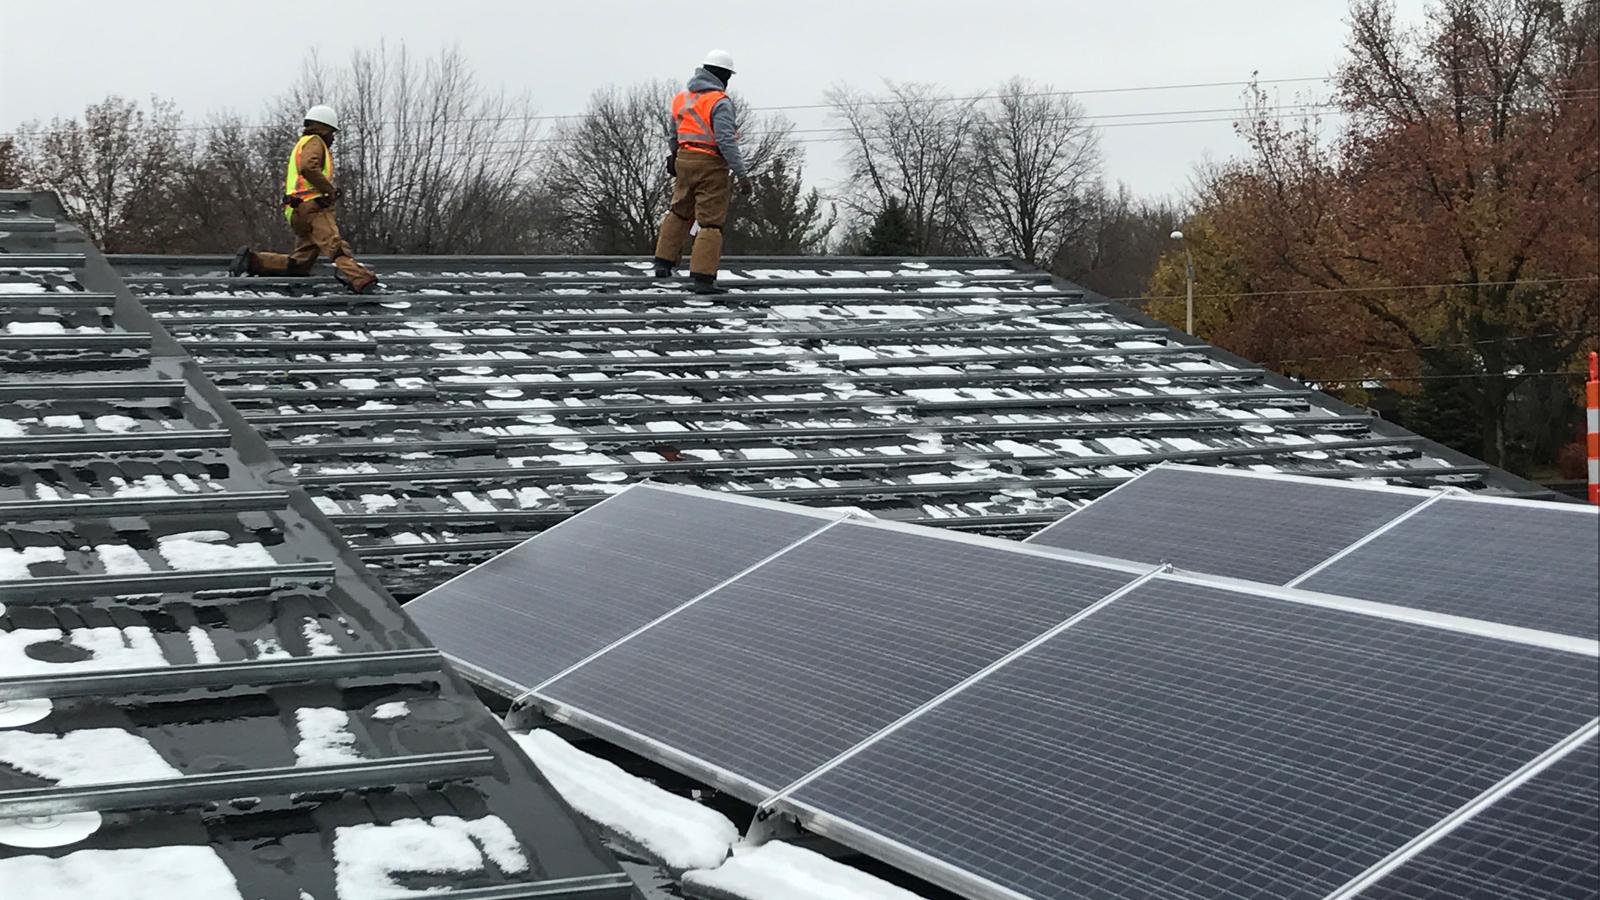 CMT HQ Roof Solar Panels